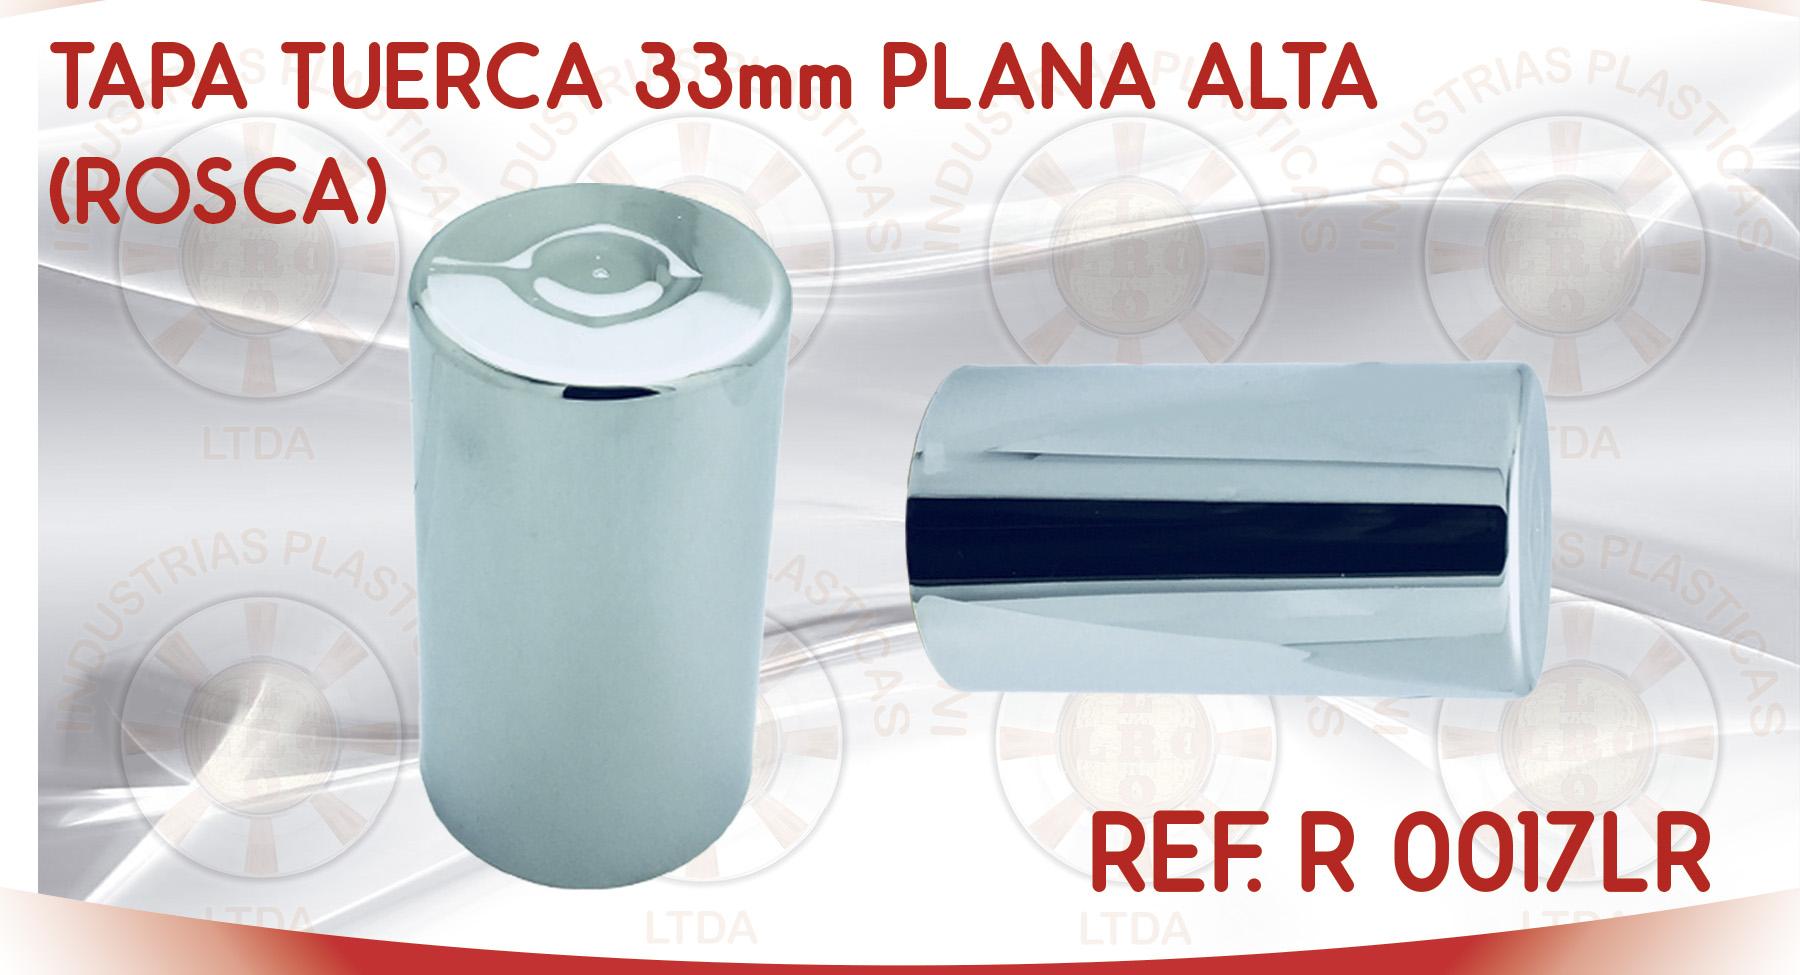 R 0017LR TAPA TUERCA 33mm PLANA ALTA ROSCA